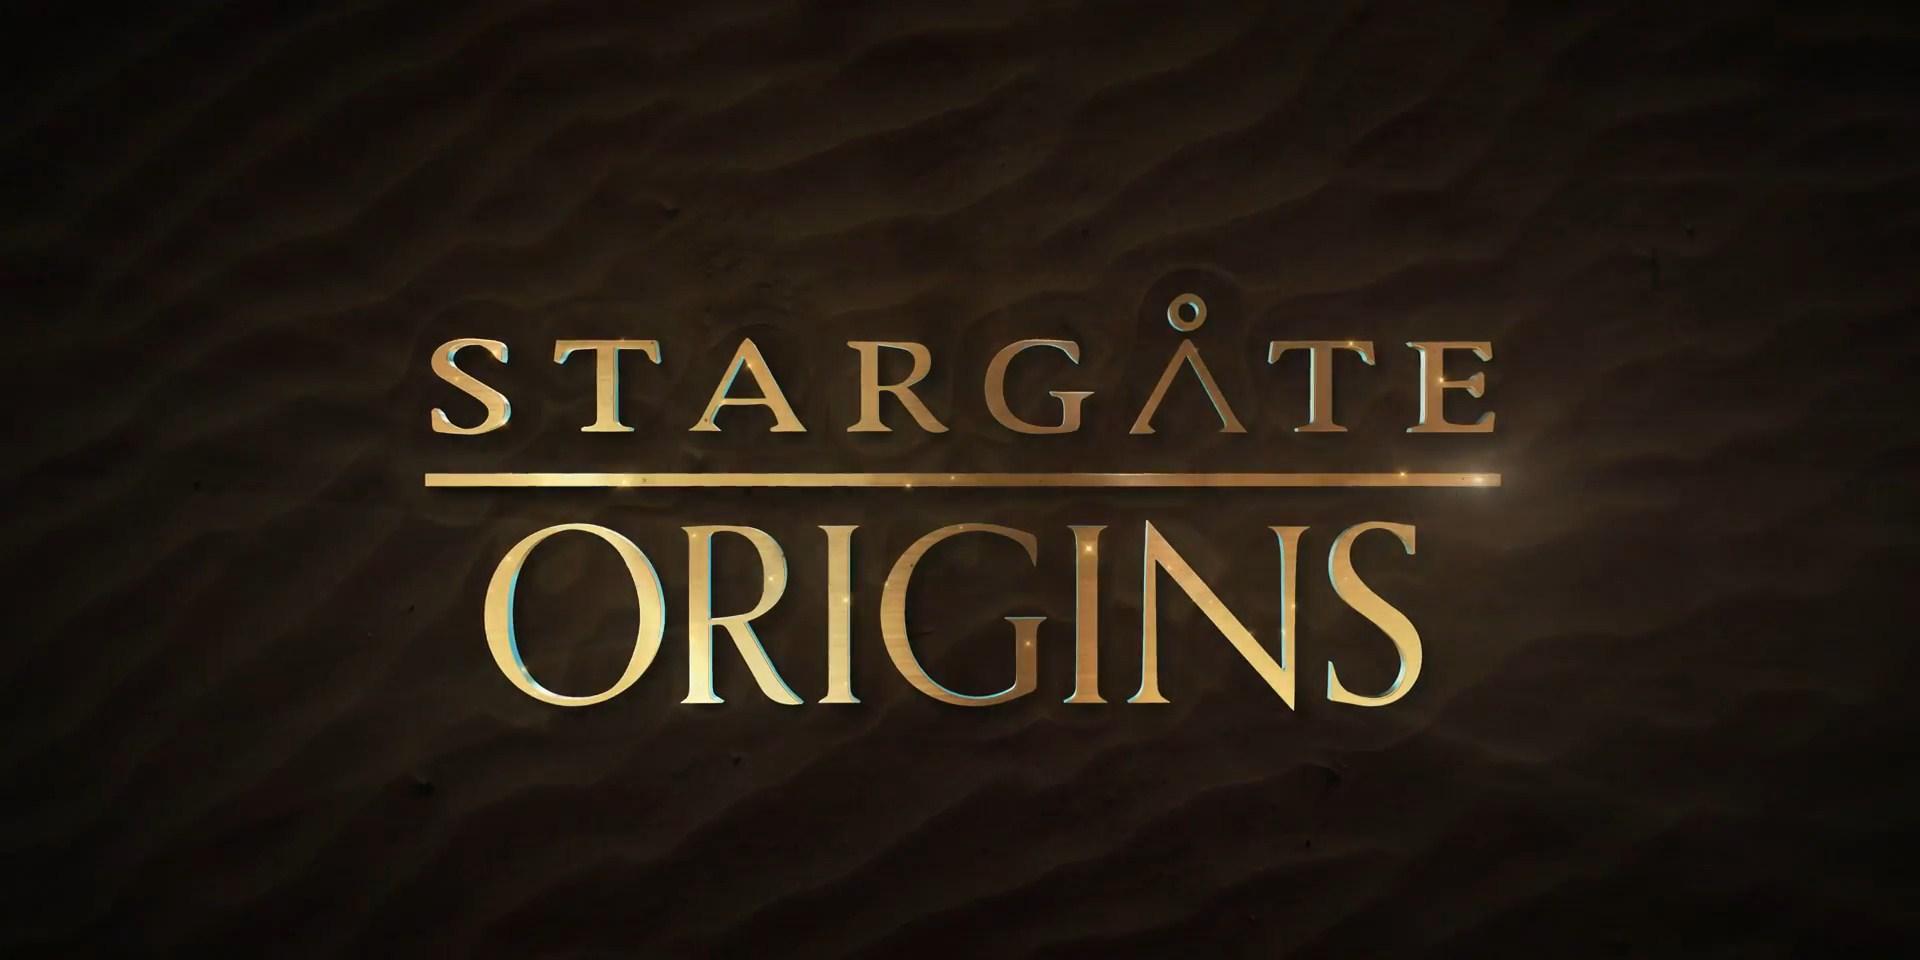 stargate_origins_s01e03_1080p_web-dl_aac2_0_h264-btn_mkv_snapshot_00_02.jpg